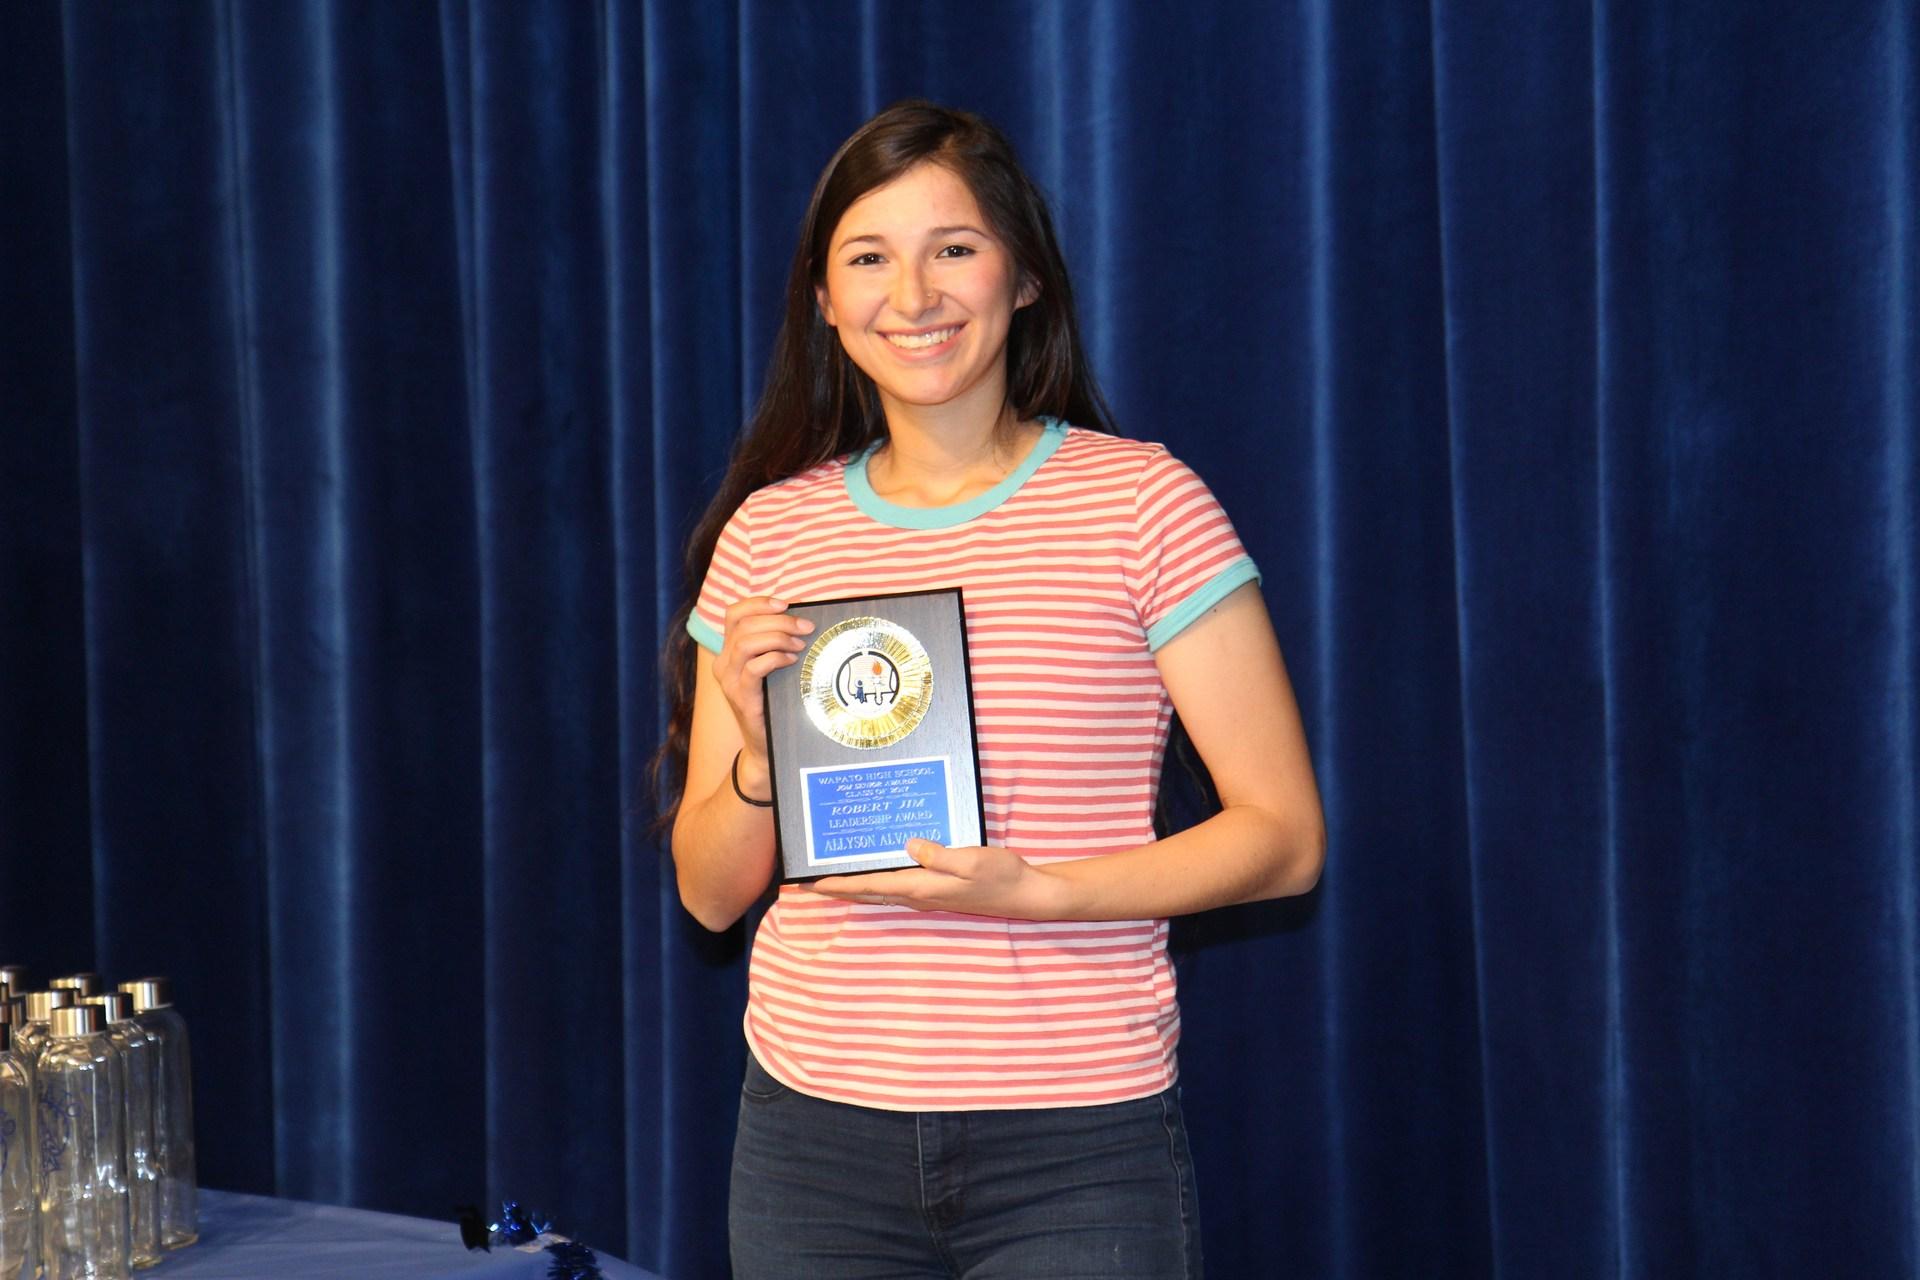 Allyson Alvarado-Wapato High School Class of 2017